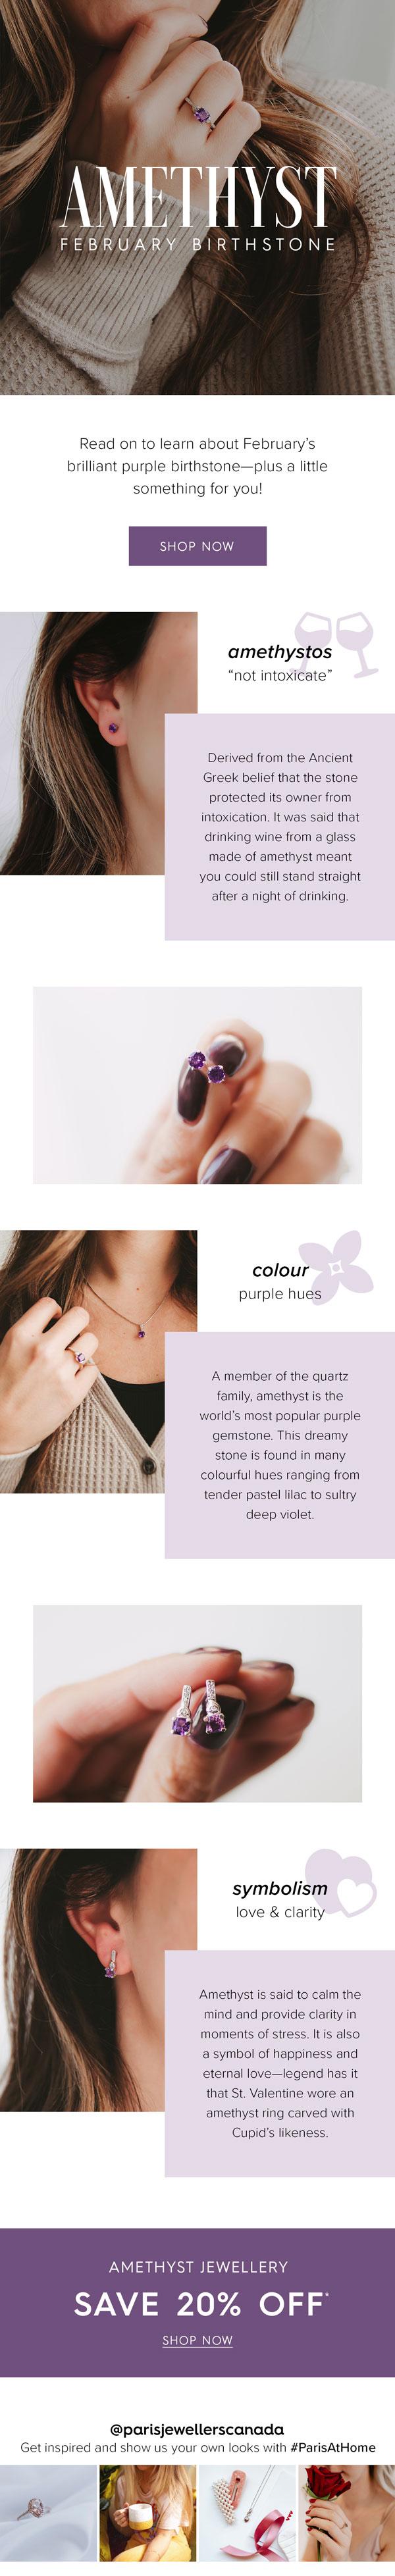 Paris Jewellers Amethyst E-newsletter